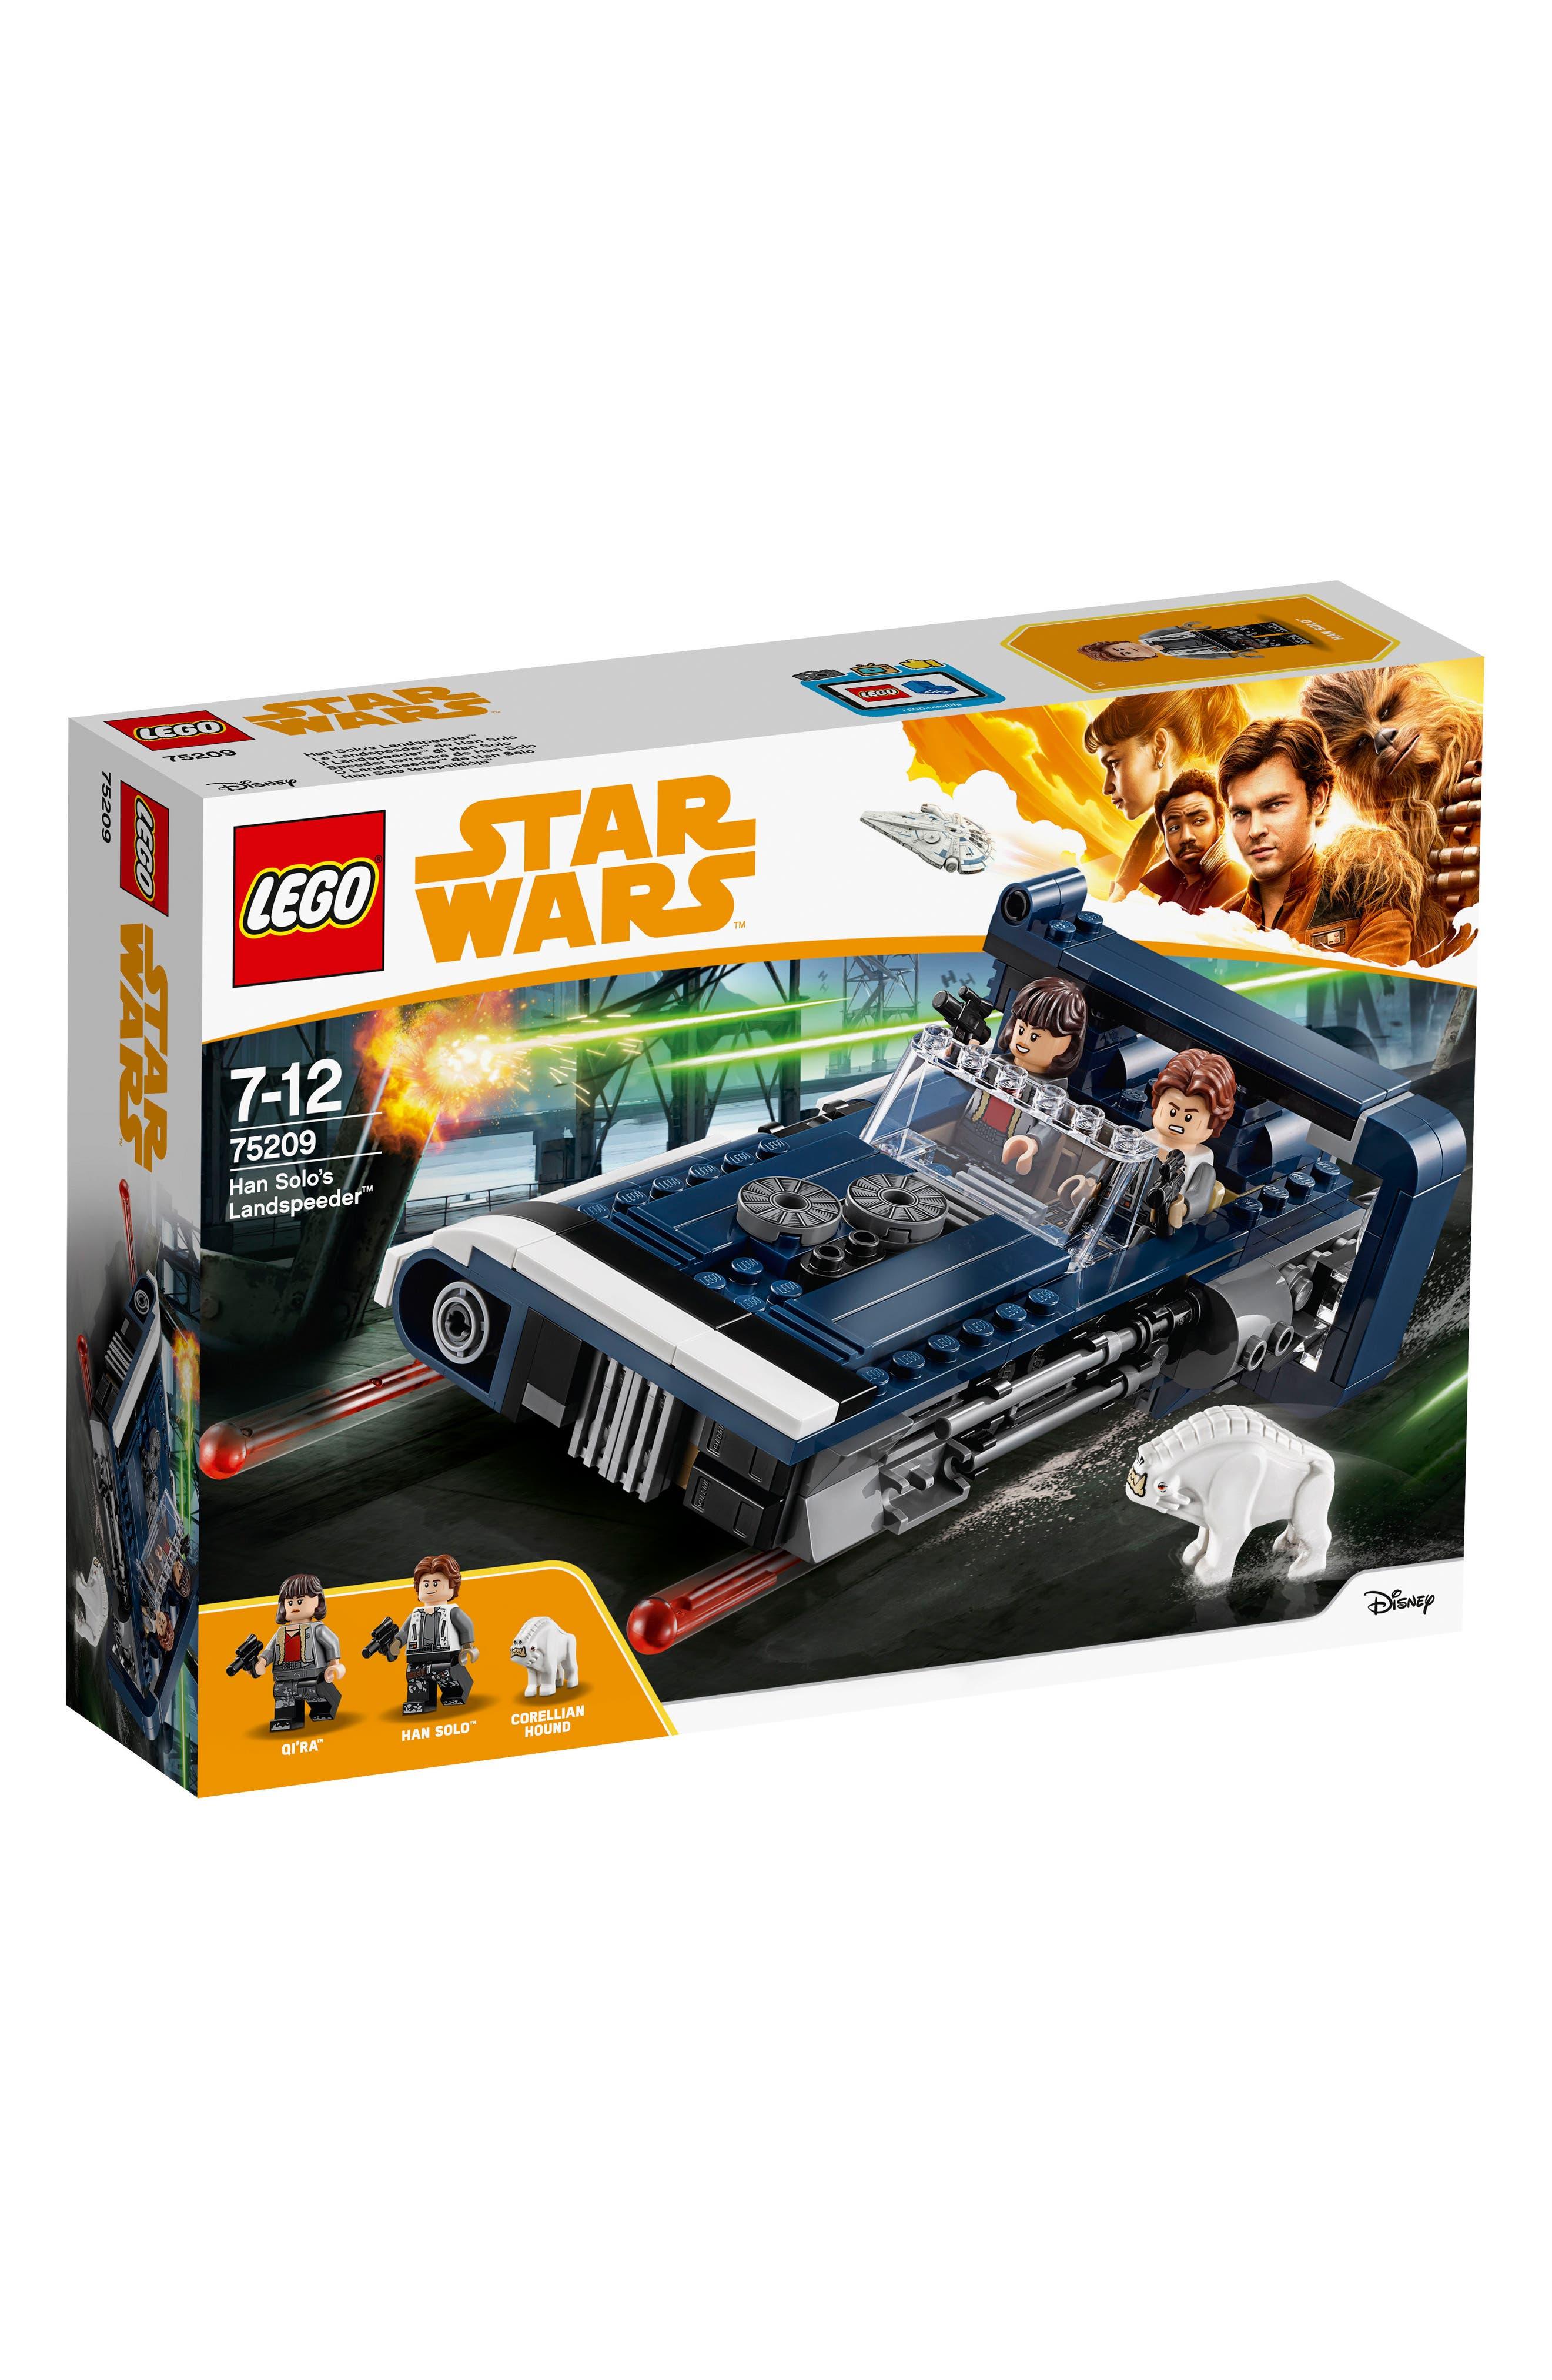 Star Wars<sup>®</sup> Han Solo's Landspeeder<sup>™</sup> - 75209,                             Main thumbnail 1, color,                             Multi